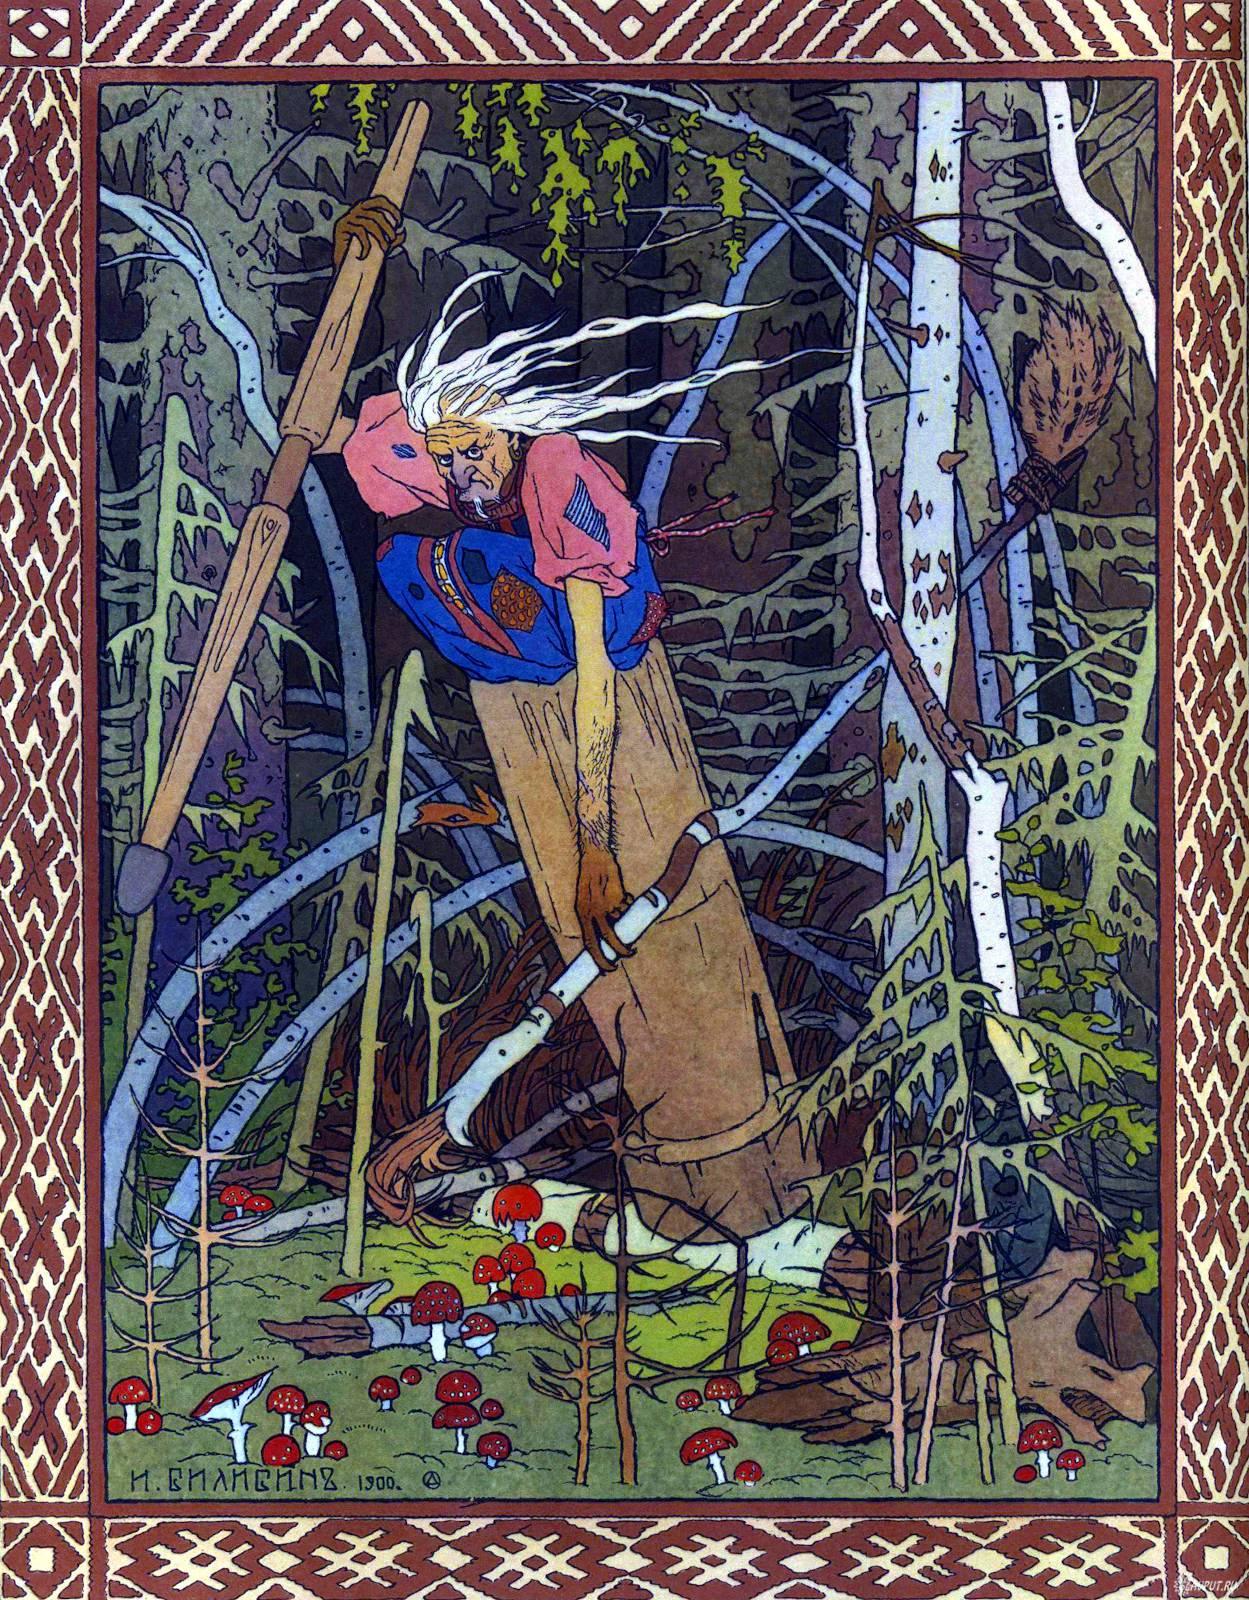 Baba Jaga fliegt auf ihrem Mörser. Iwan Bilibin, 1899. (Bild: Wikipedia)